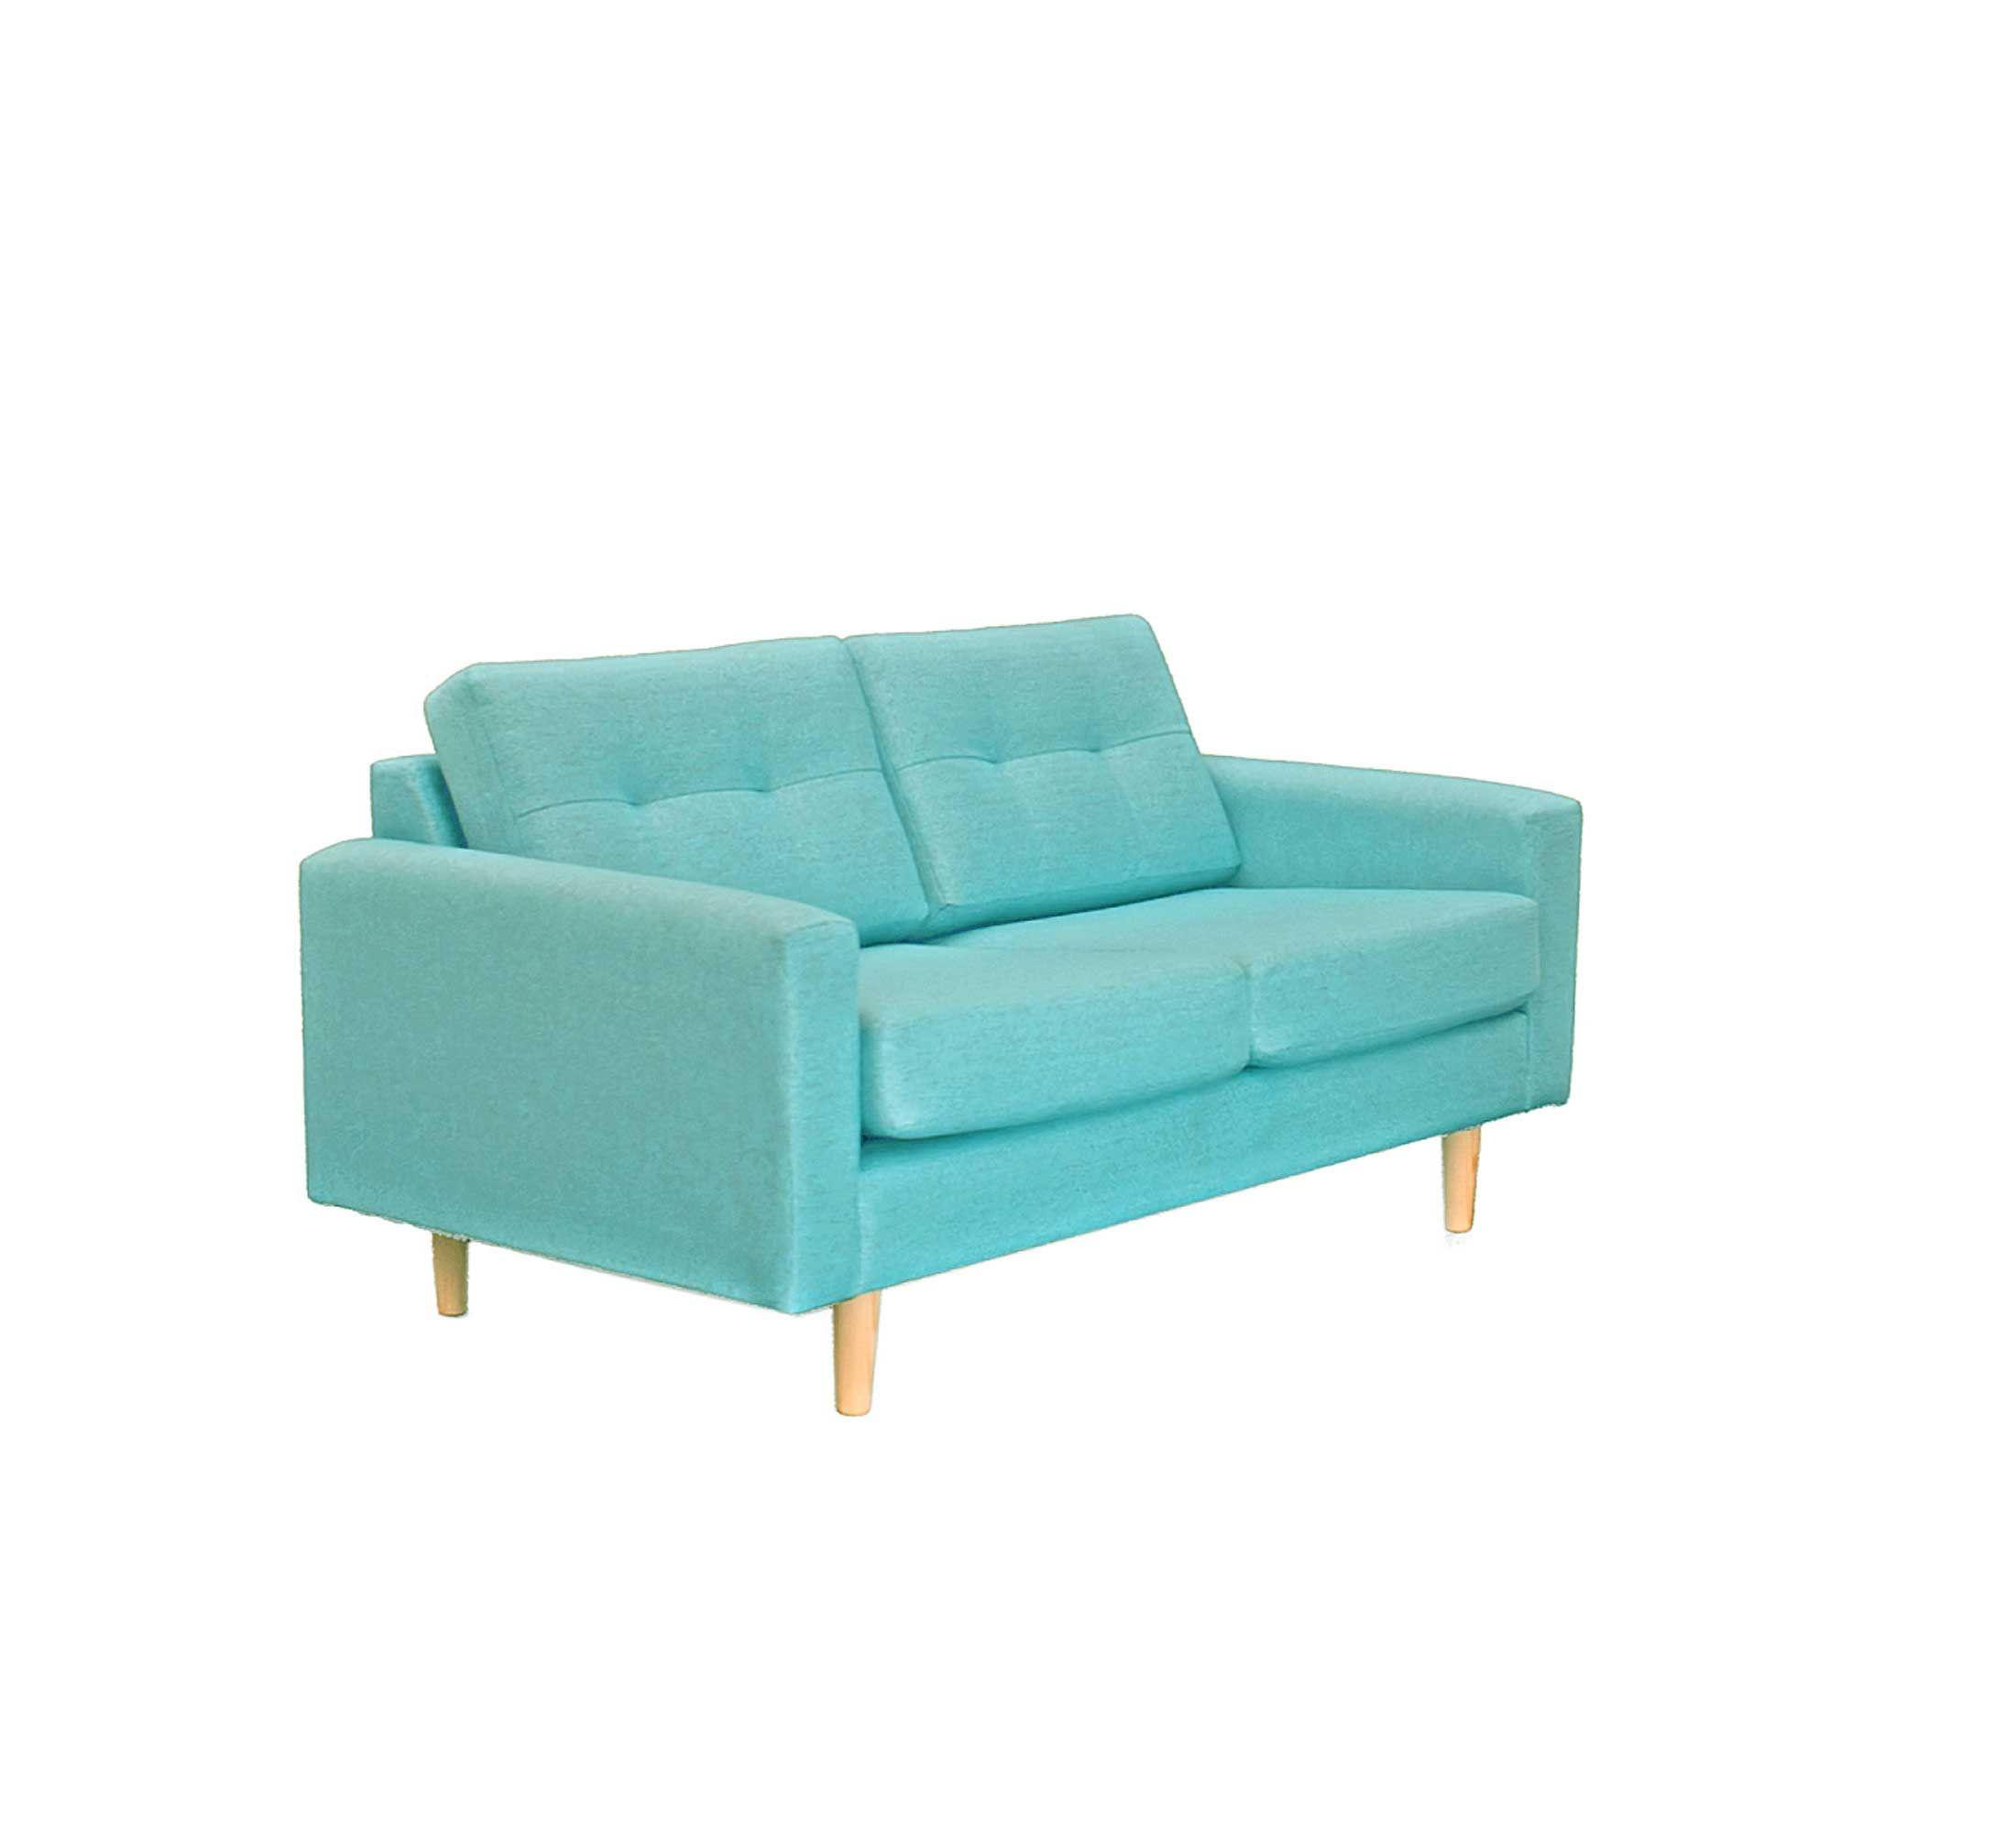 Jazz 2 Seater Sofa Sofas Armchairs Categories Fantastic Furniture Australia S Best Value Bedding